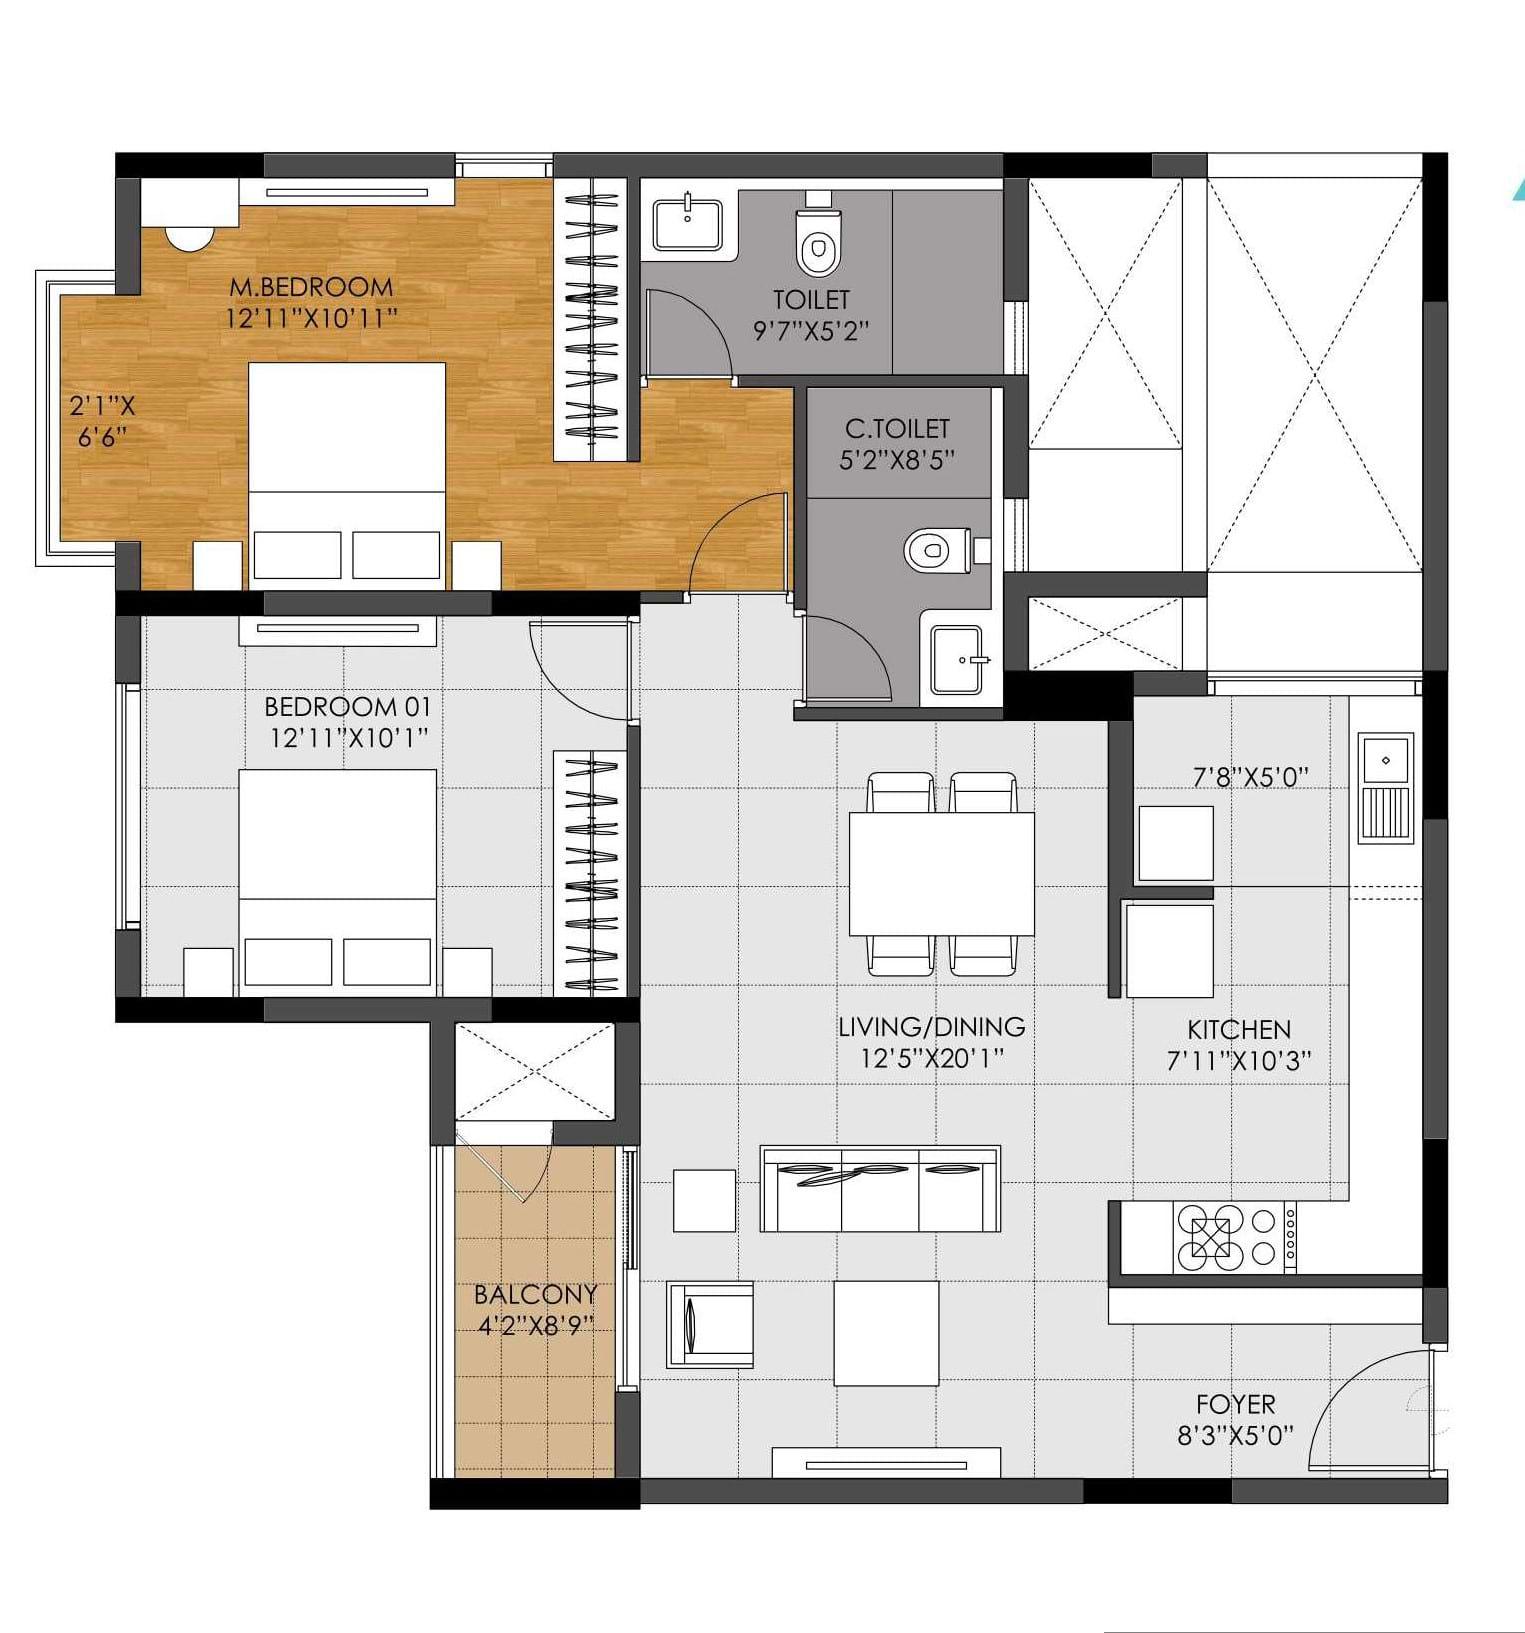 DNR-Casablanca-2bhk-1274-sqft-floorplan